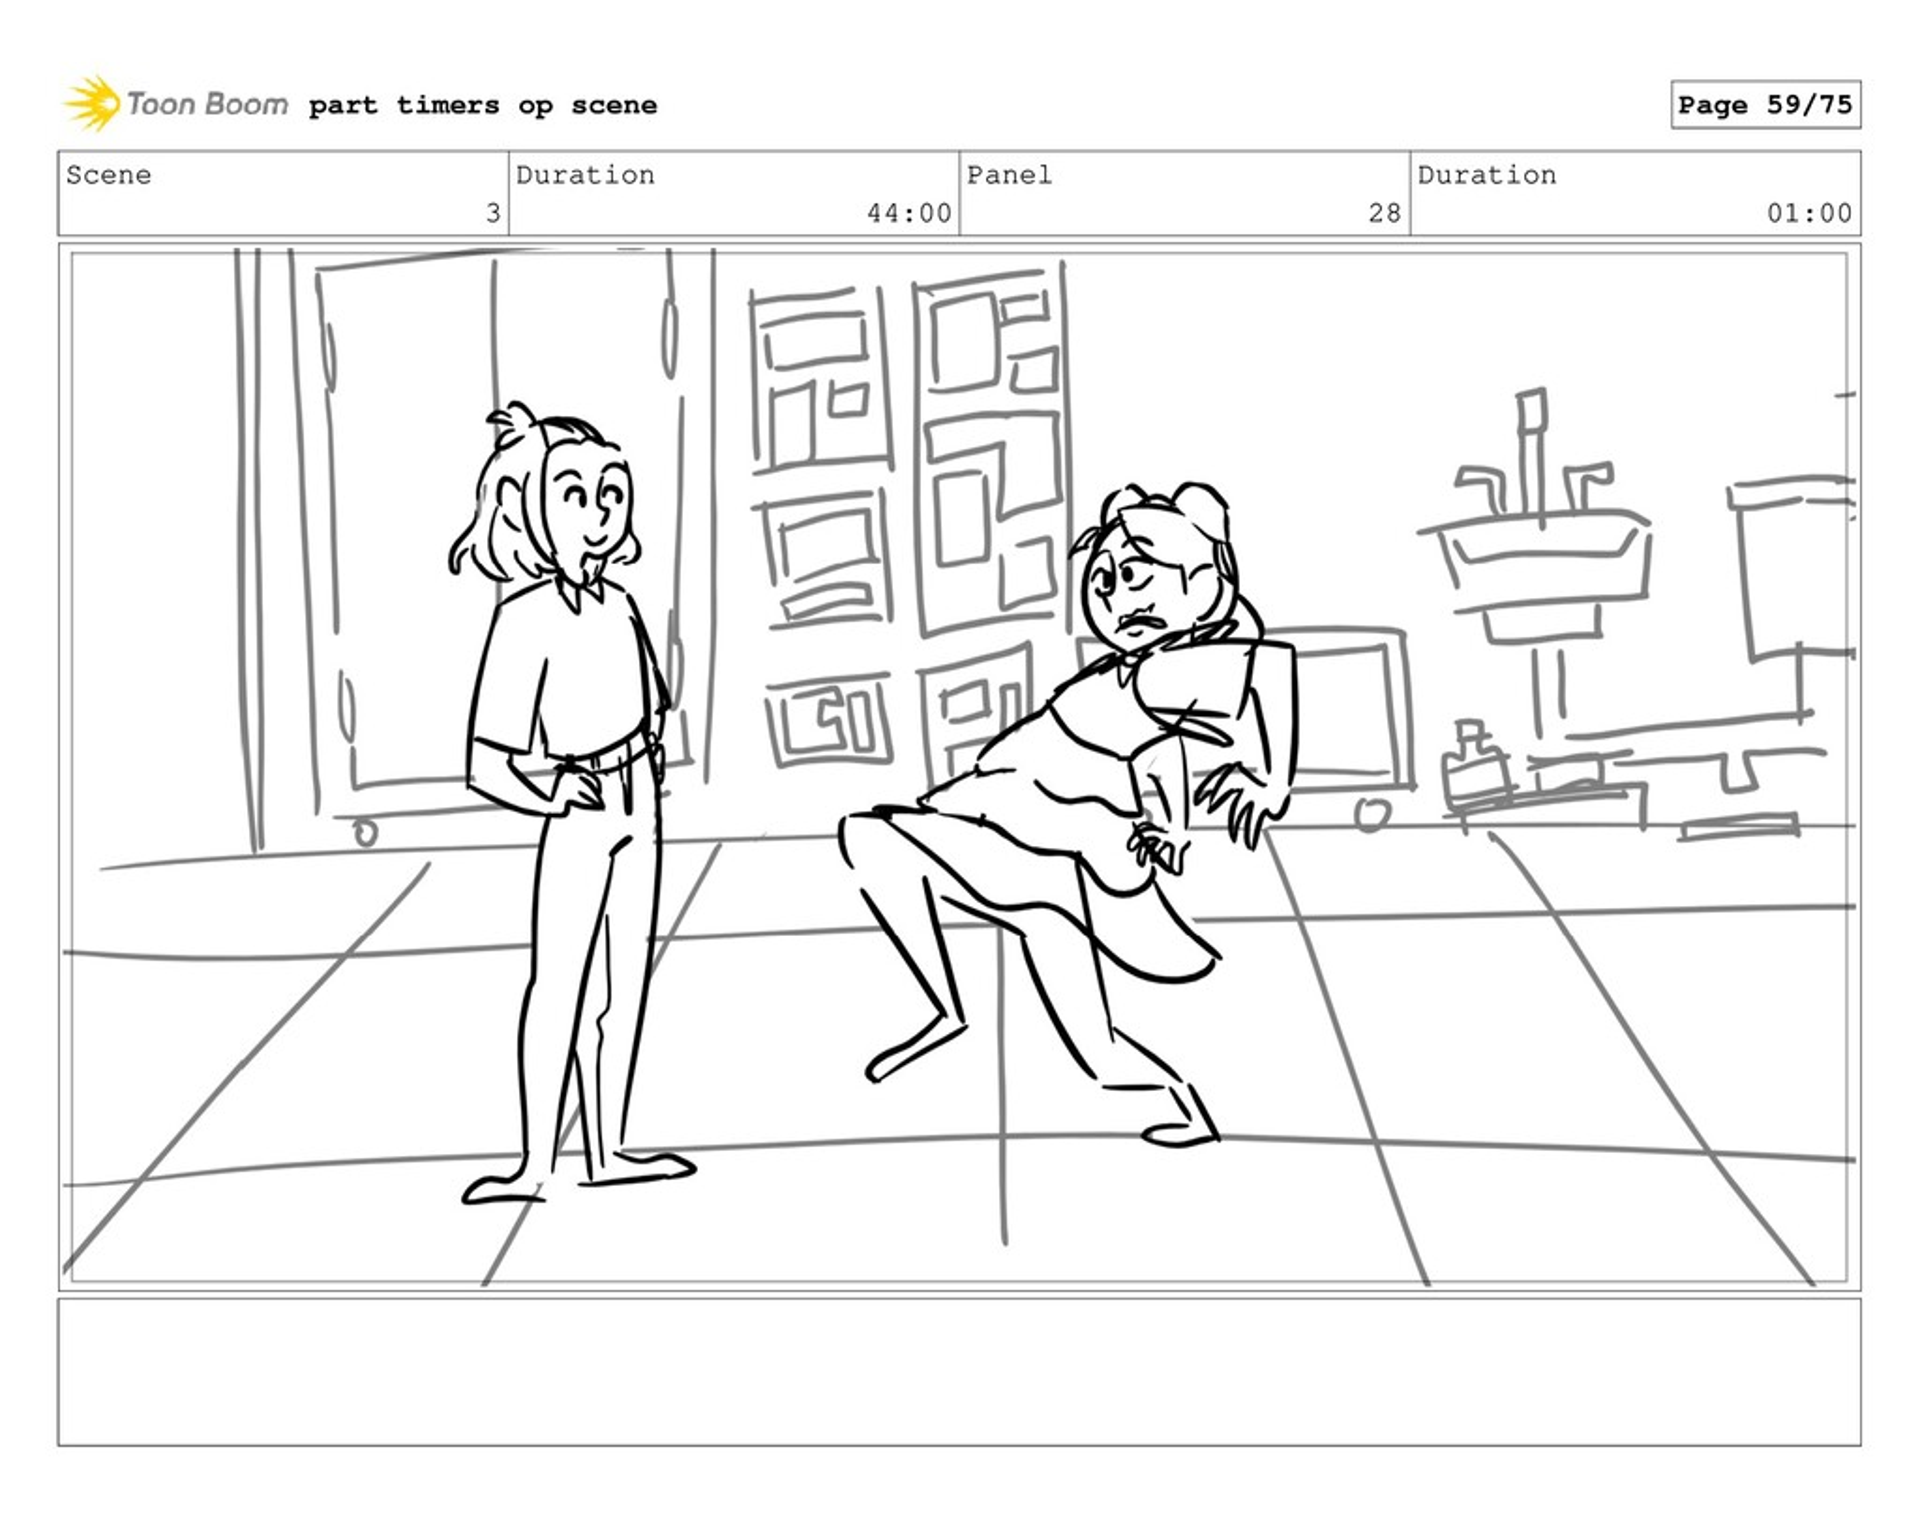 Scene 3 Duration 44:00 Panel 28 Duration 01:00 ...